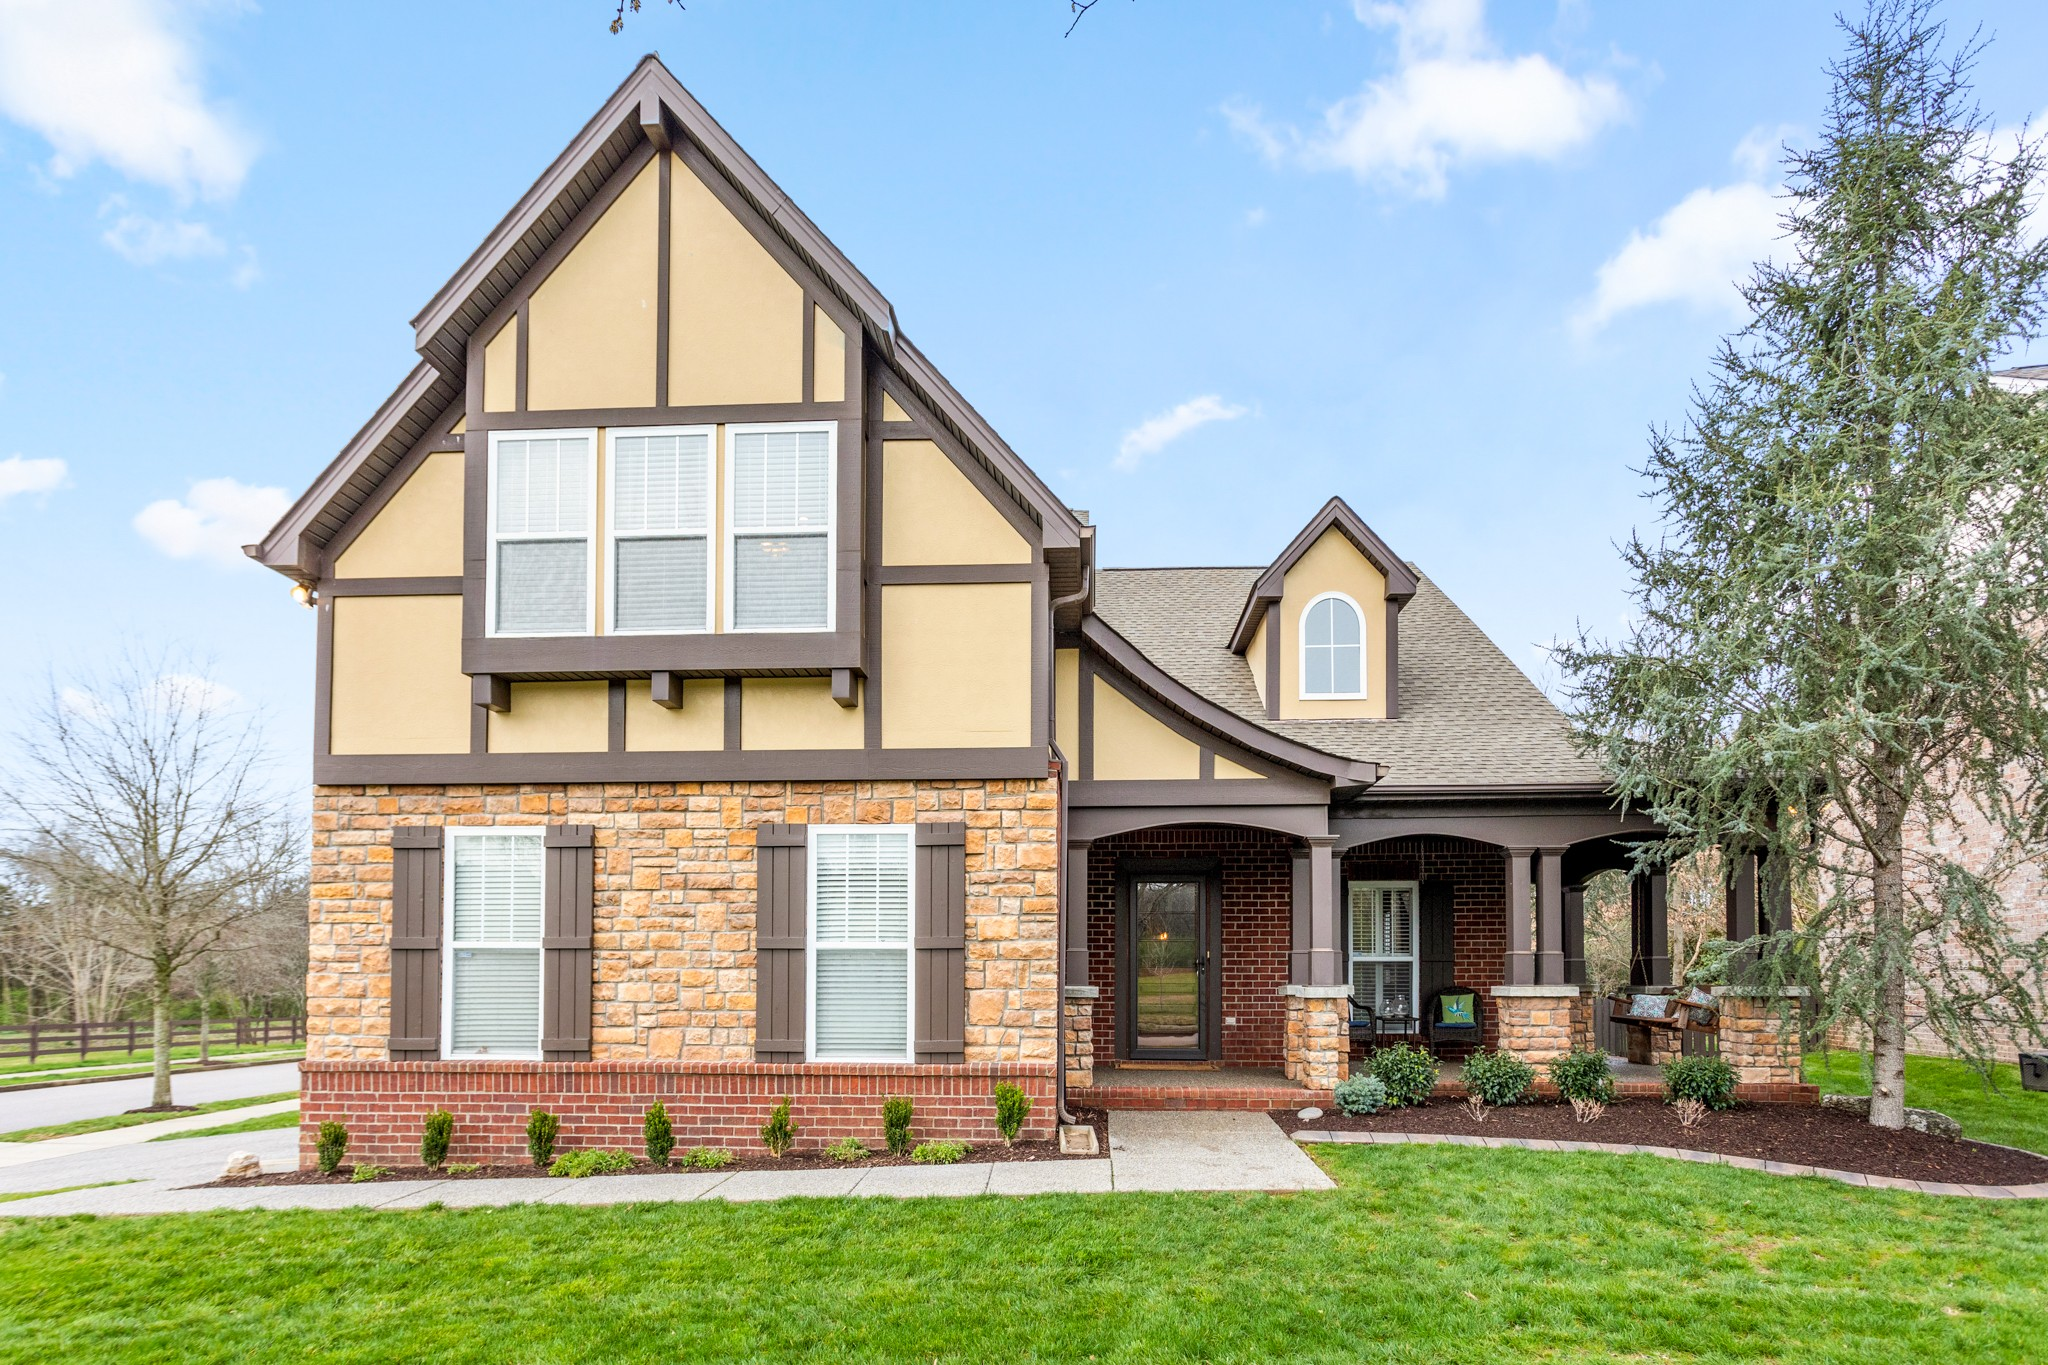 8936 Macauley Ln, Nolensville, TN 37135 - Nolensville, TN real estate listing